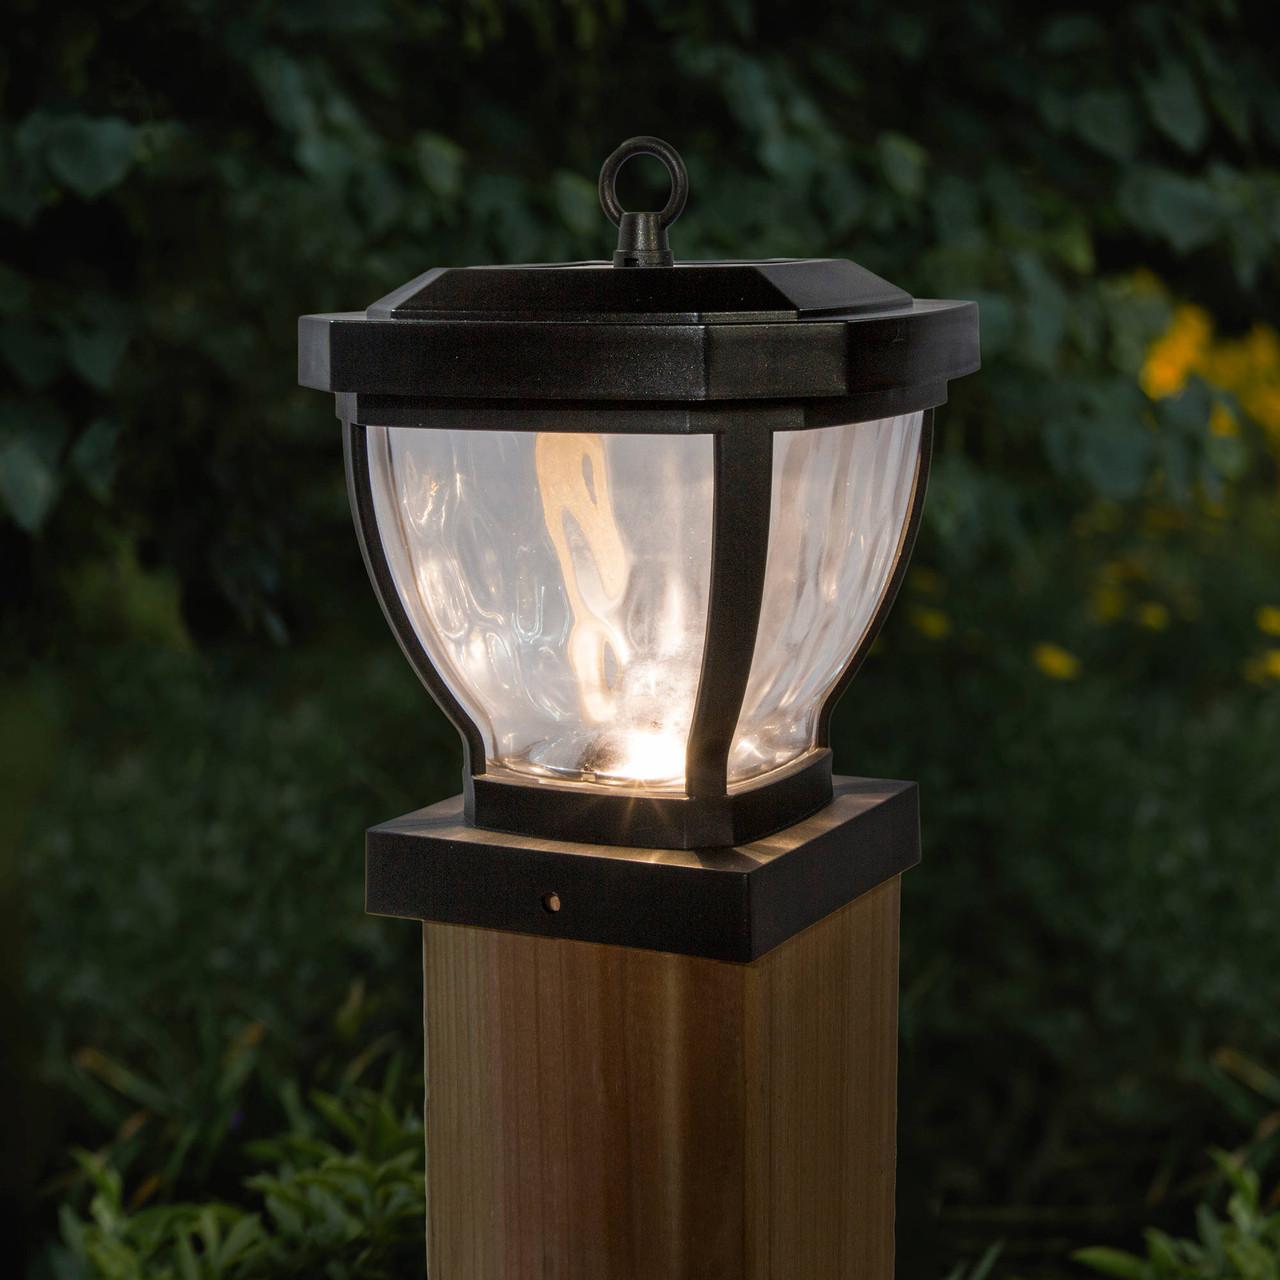 Classy Caps Manchester 4x4 Dark Bronze Solar Post Cap on Wood Post Illuminated at Night